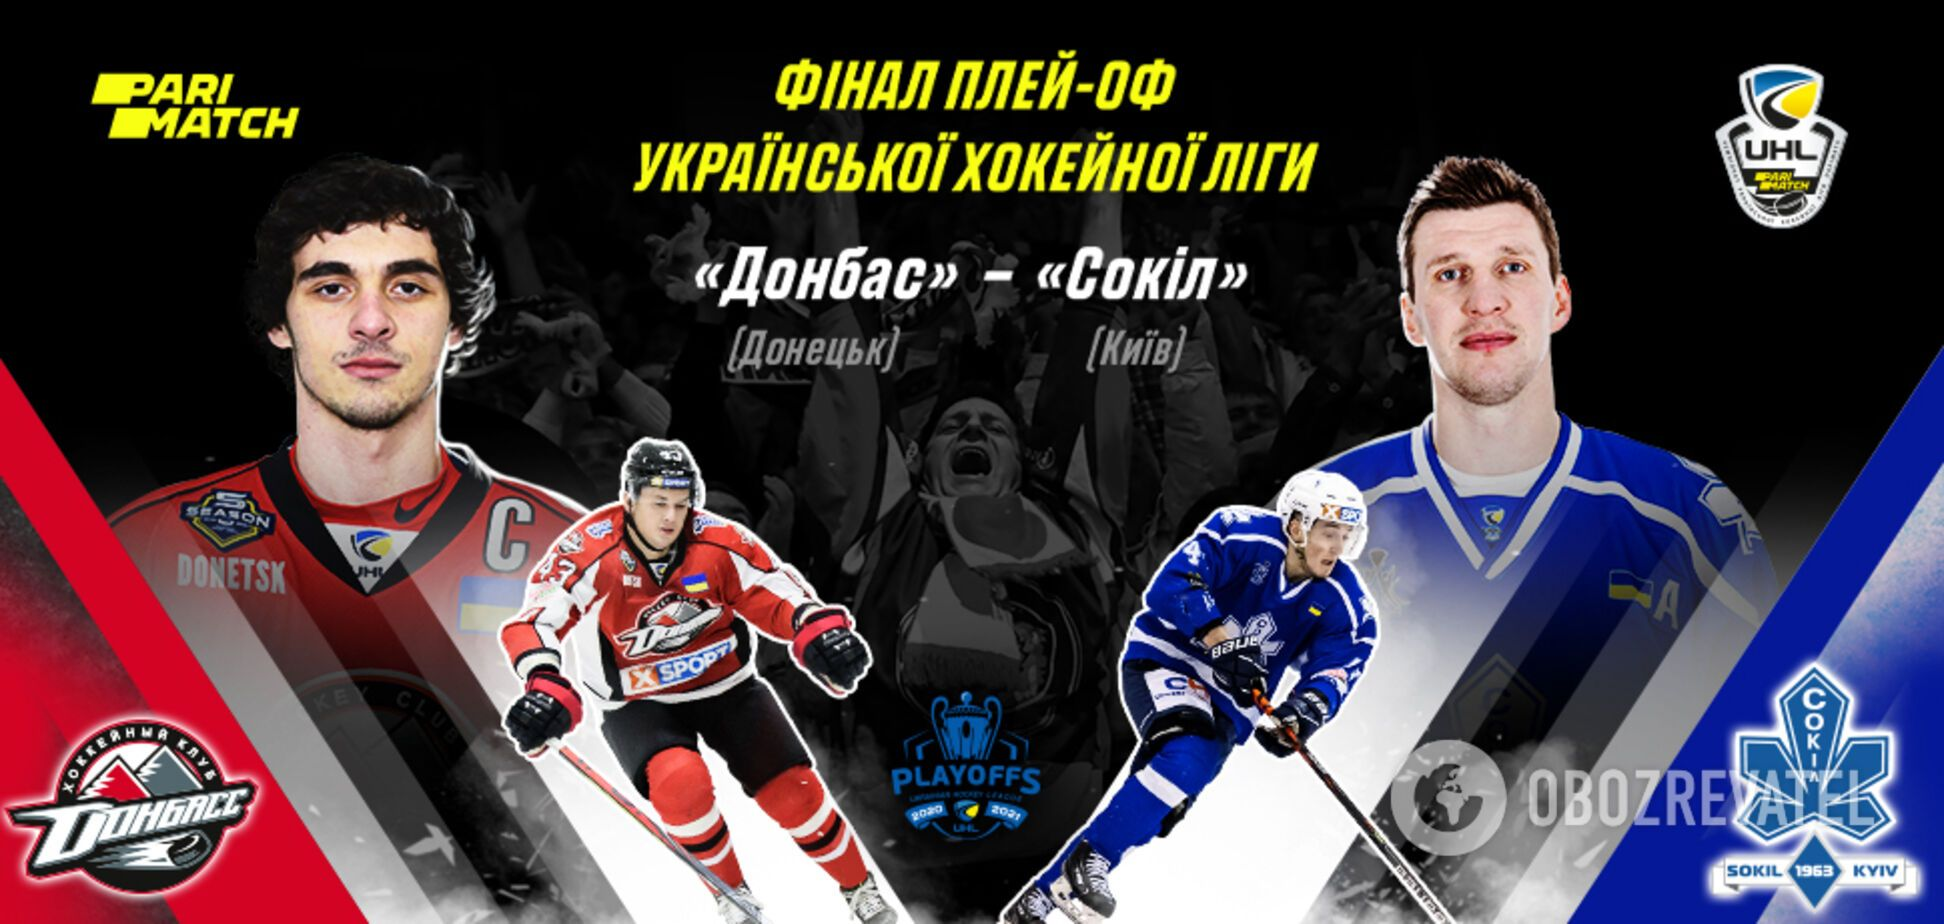 'Донбас' – 'Сокіл': анонс і прогноз на перший матч фінальної серії УХЛ